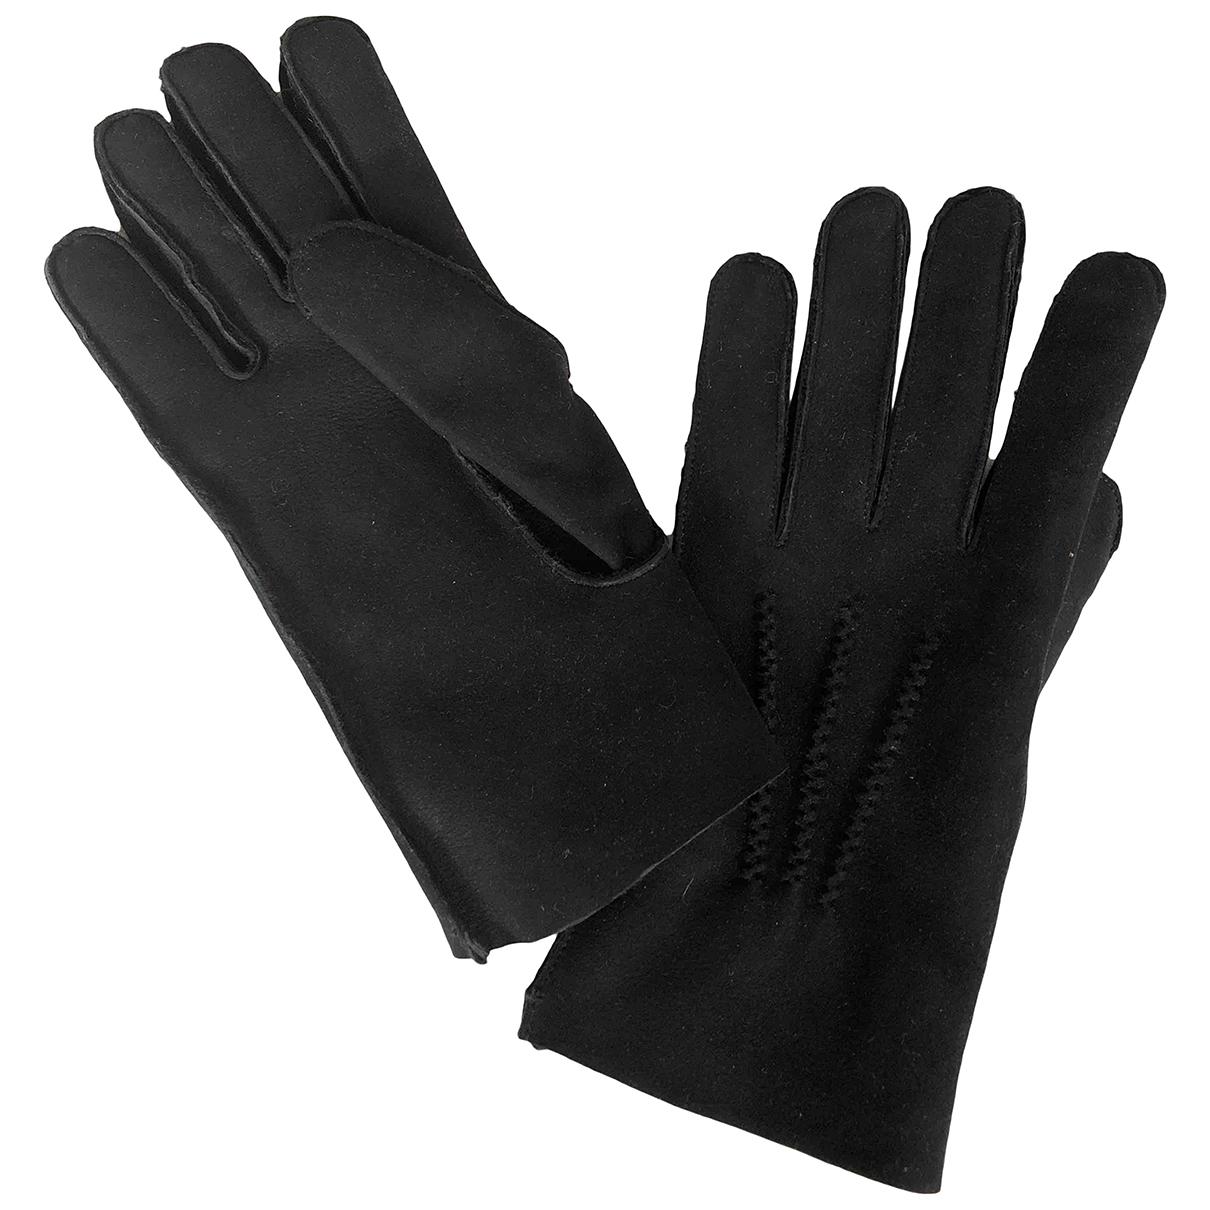 Apc \N Handschuhe in  Schwarz Mongolisches Lamm